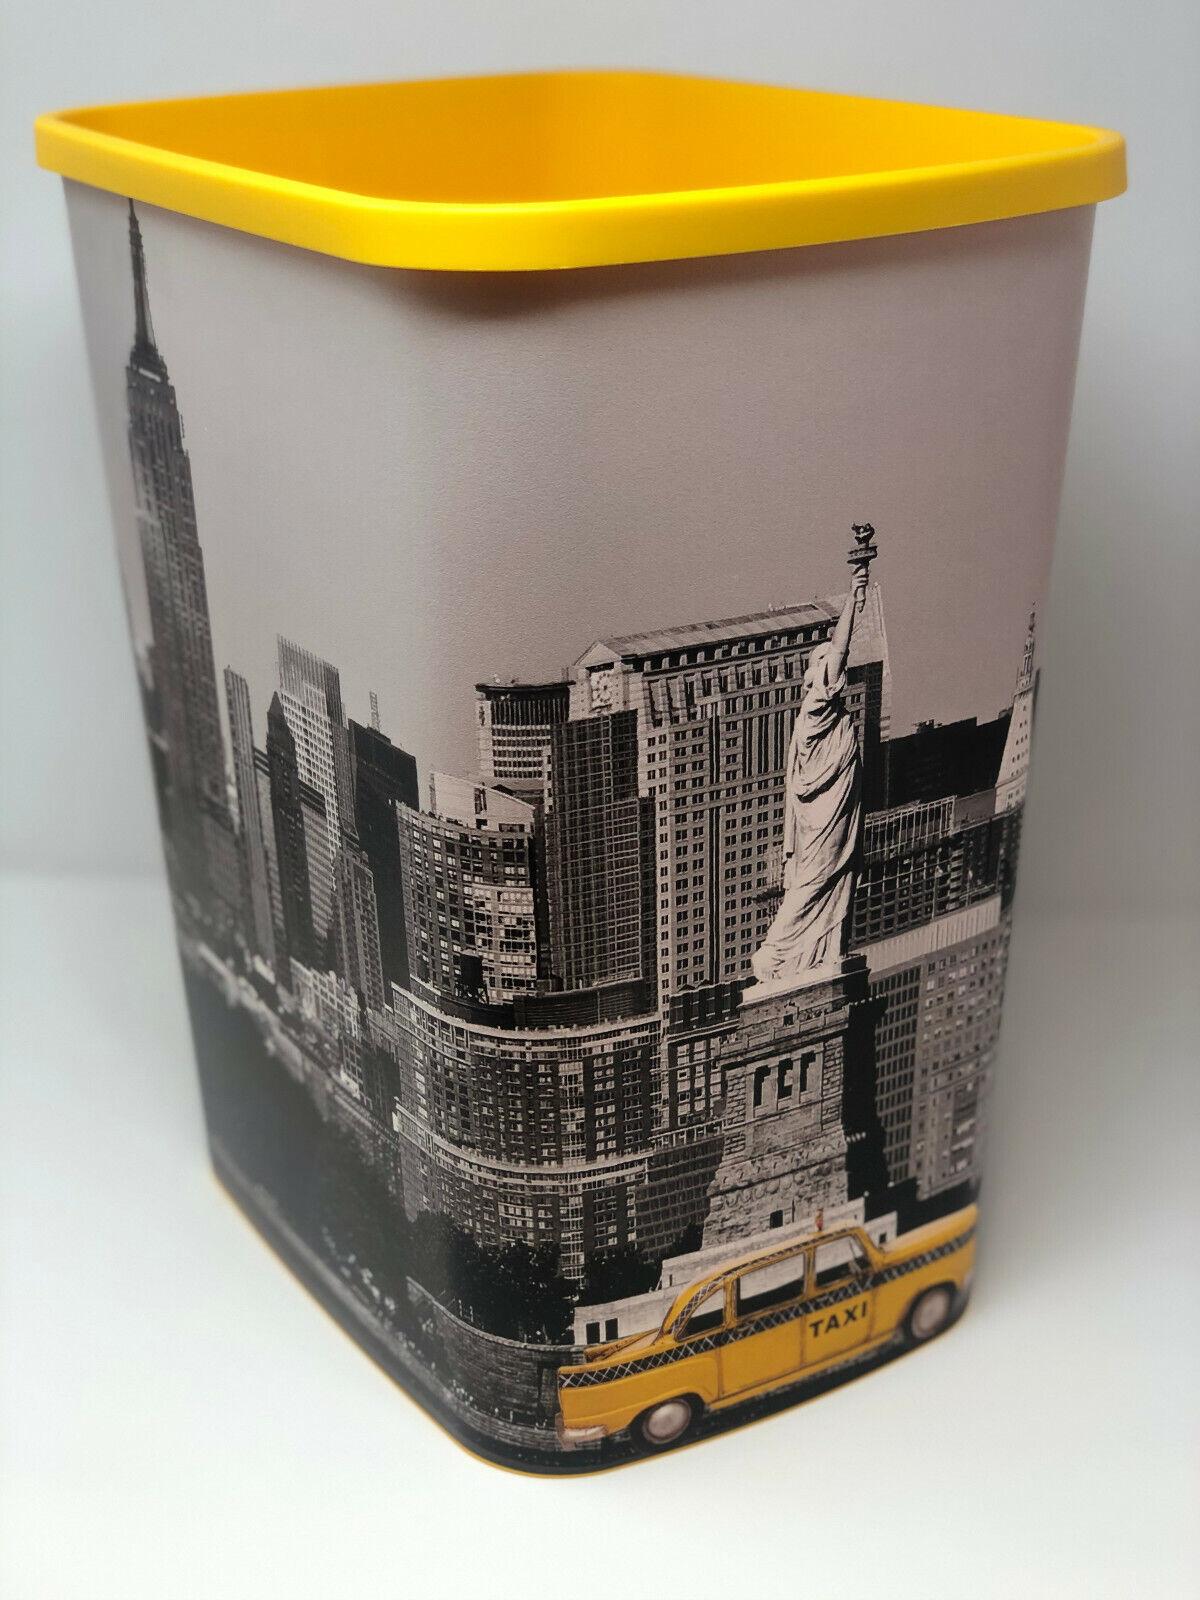 Hochwertiger Curver Papierkorb New York City 25 Liter / 39 cm hoch